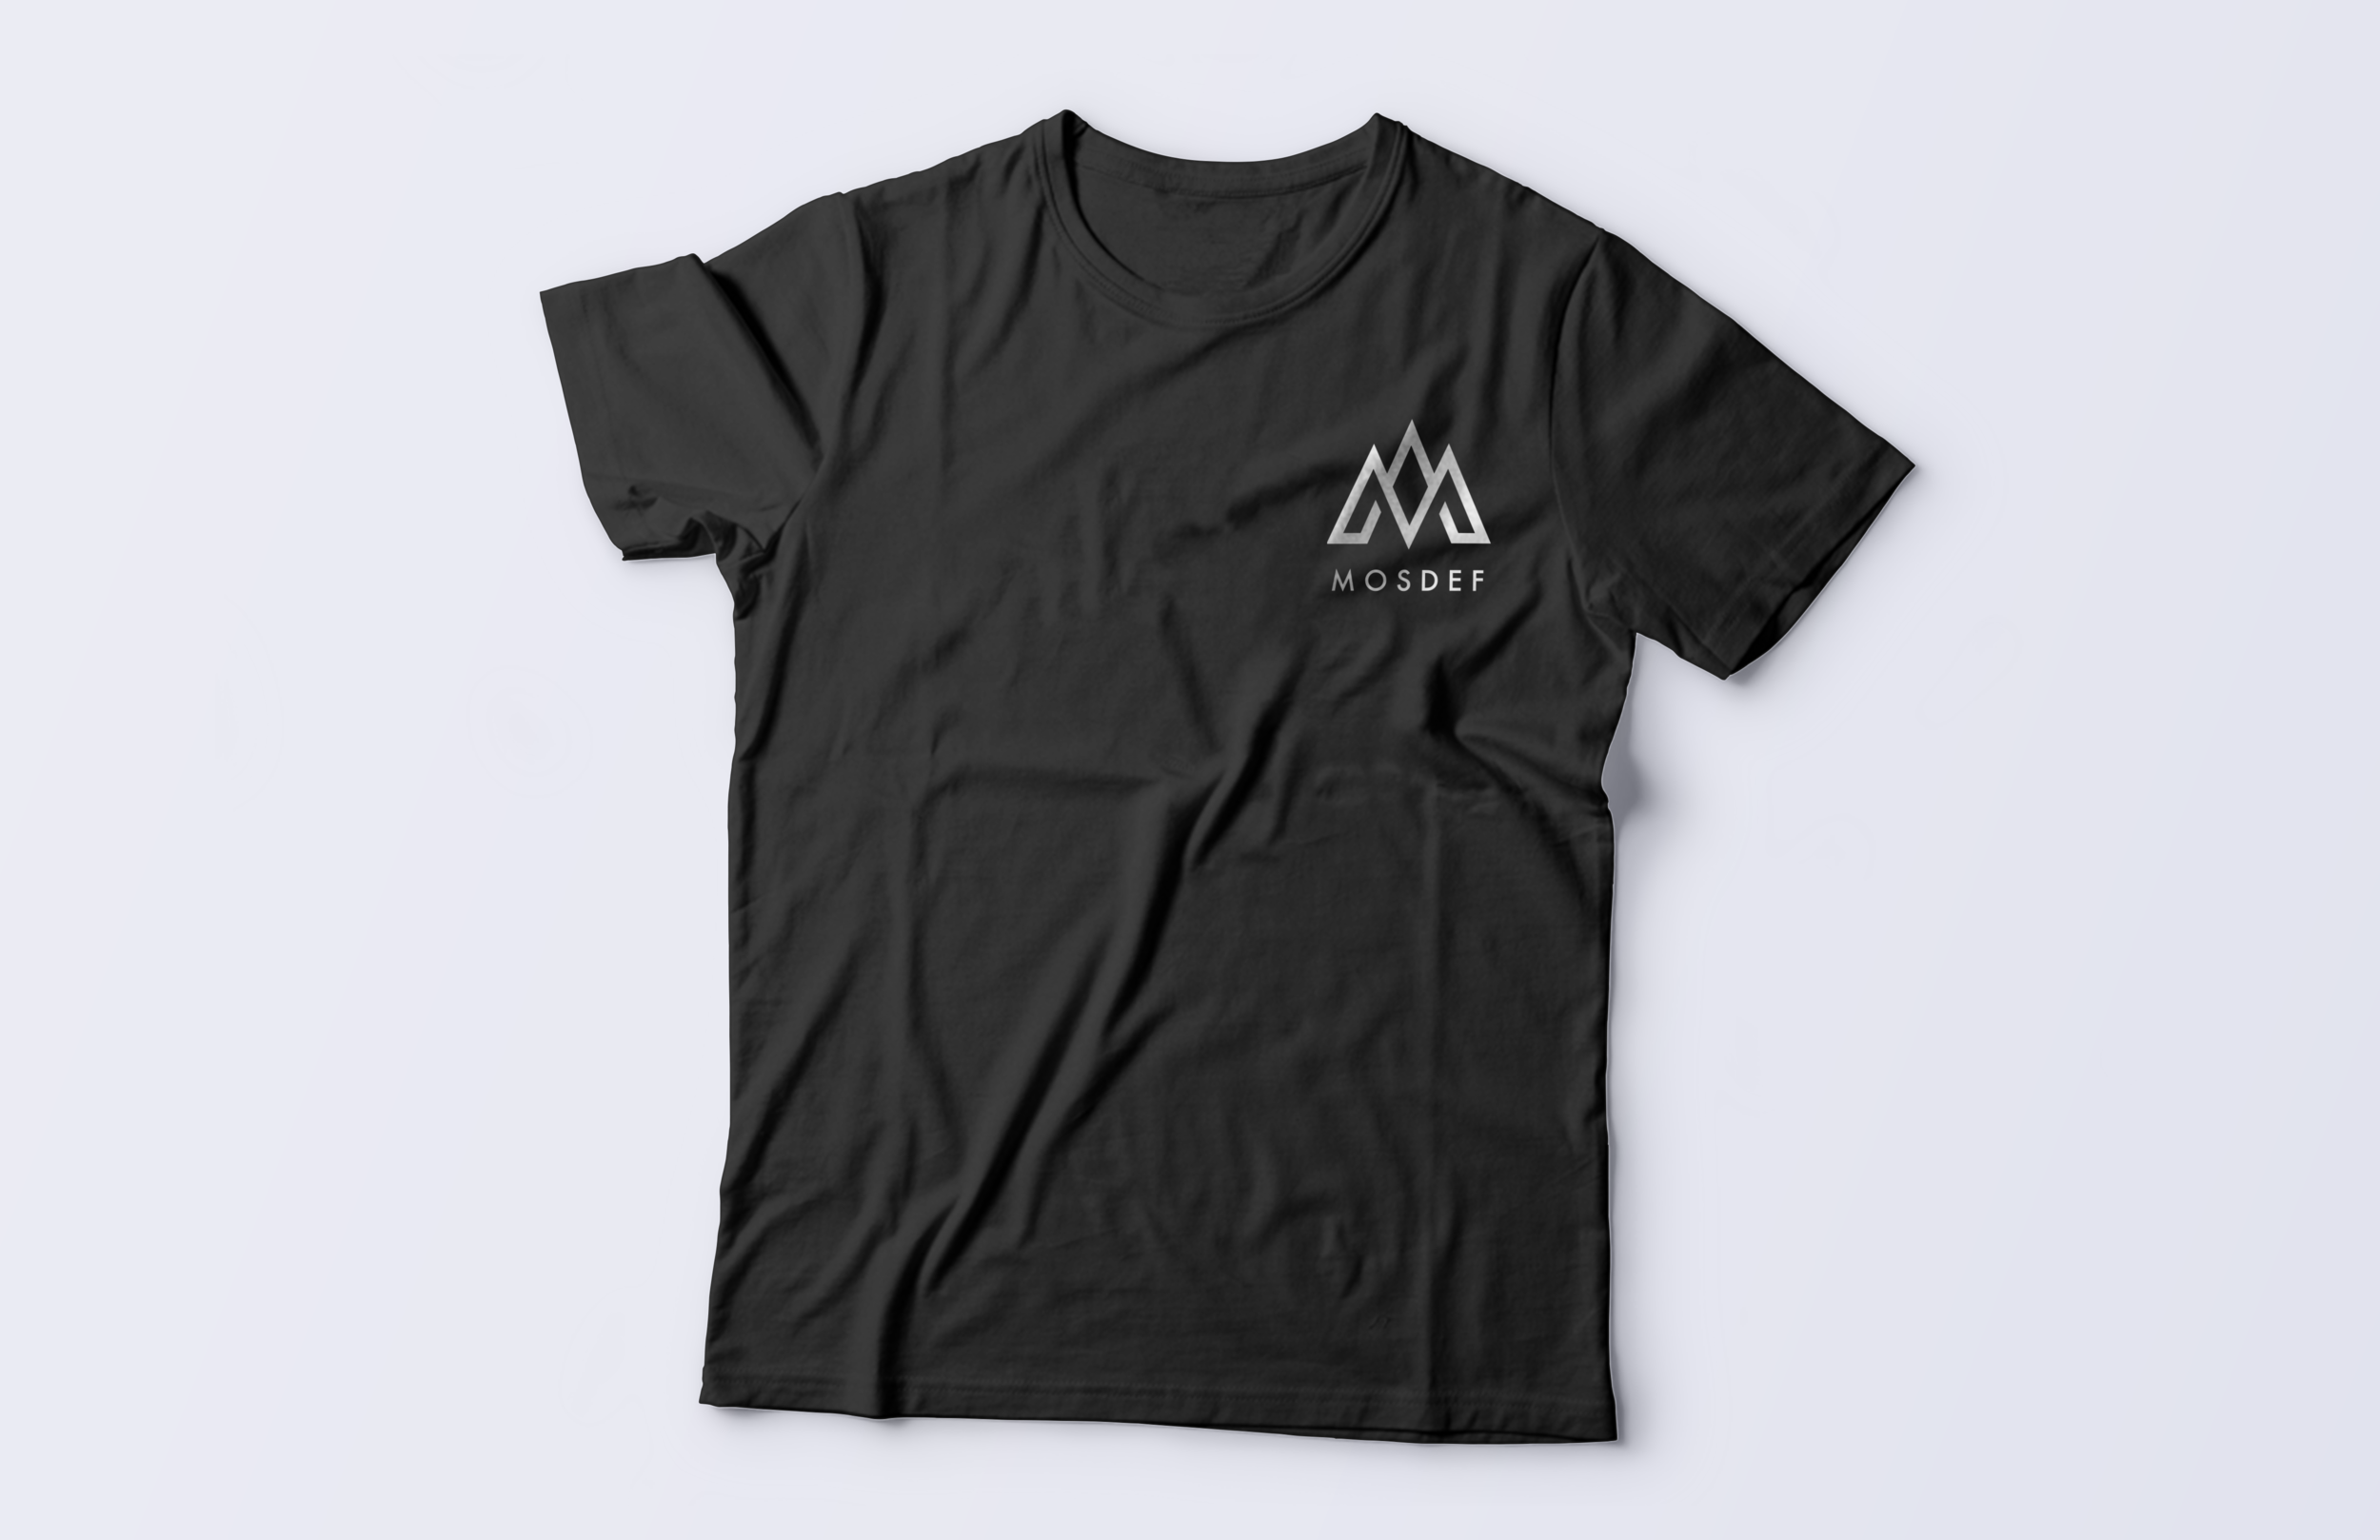 MOSDEF_Shirt1.png